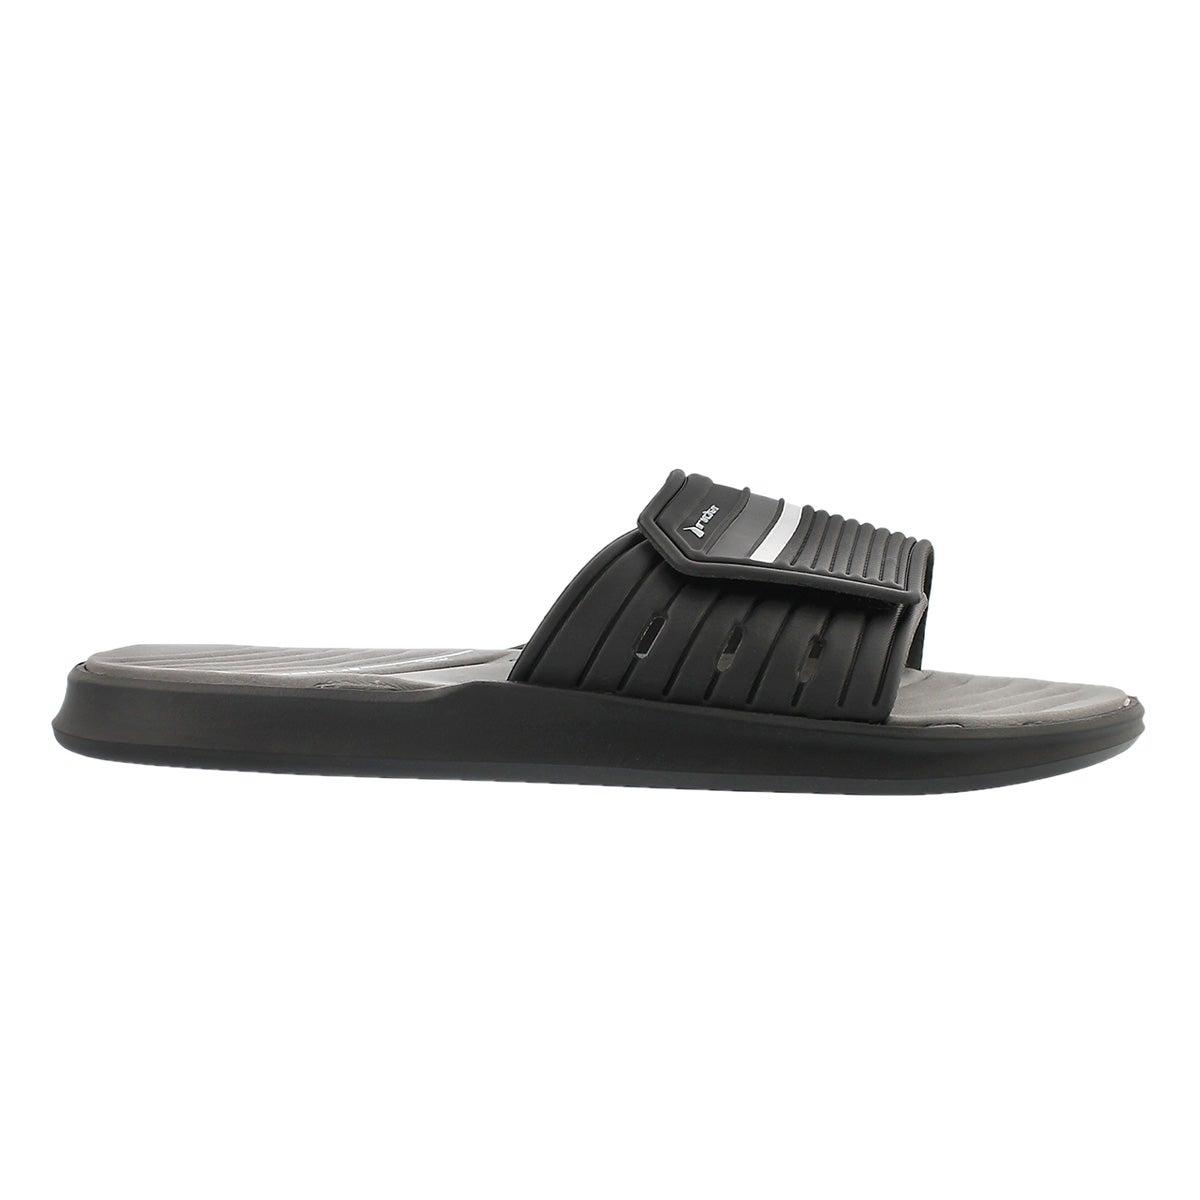 Mns Rail black/grey slide sport sandal